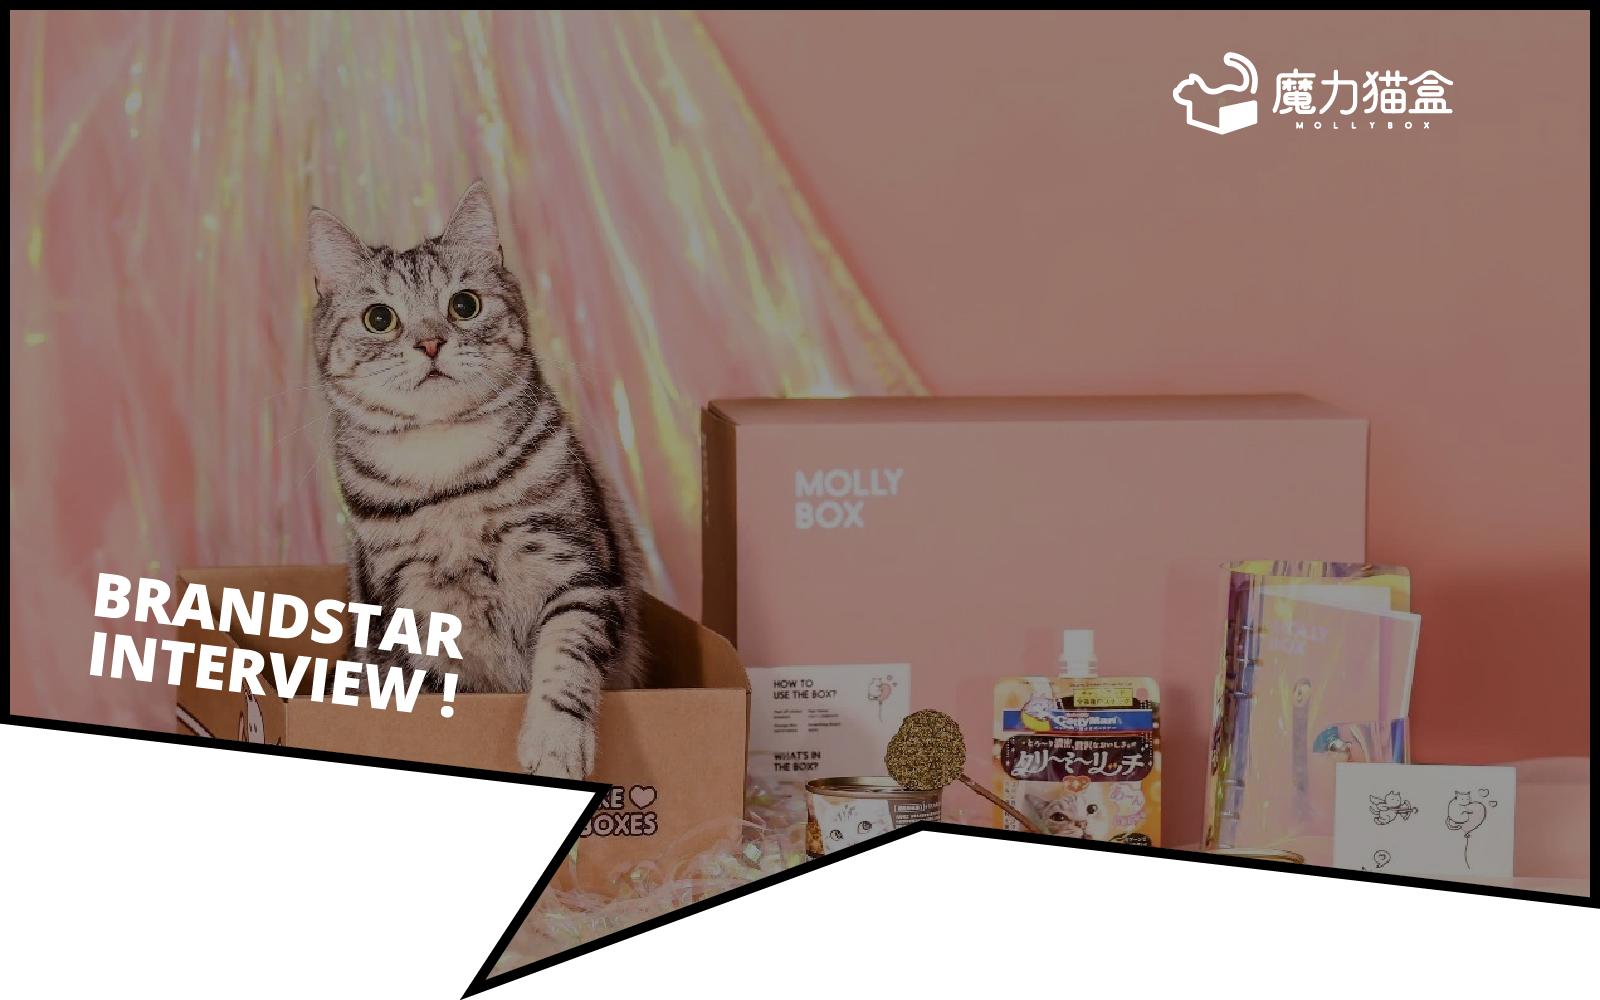 MollyBox 创始人自述:回国扎根宠物行业,我的创业故事和获客之道 | BrandStar专访